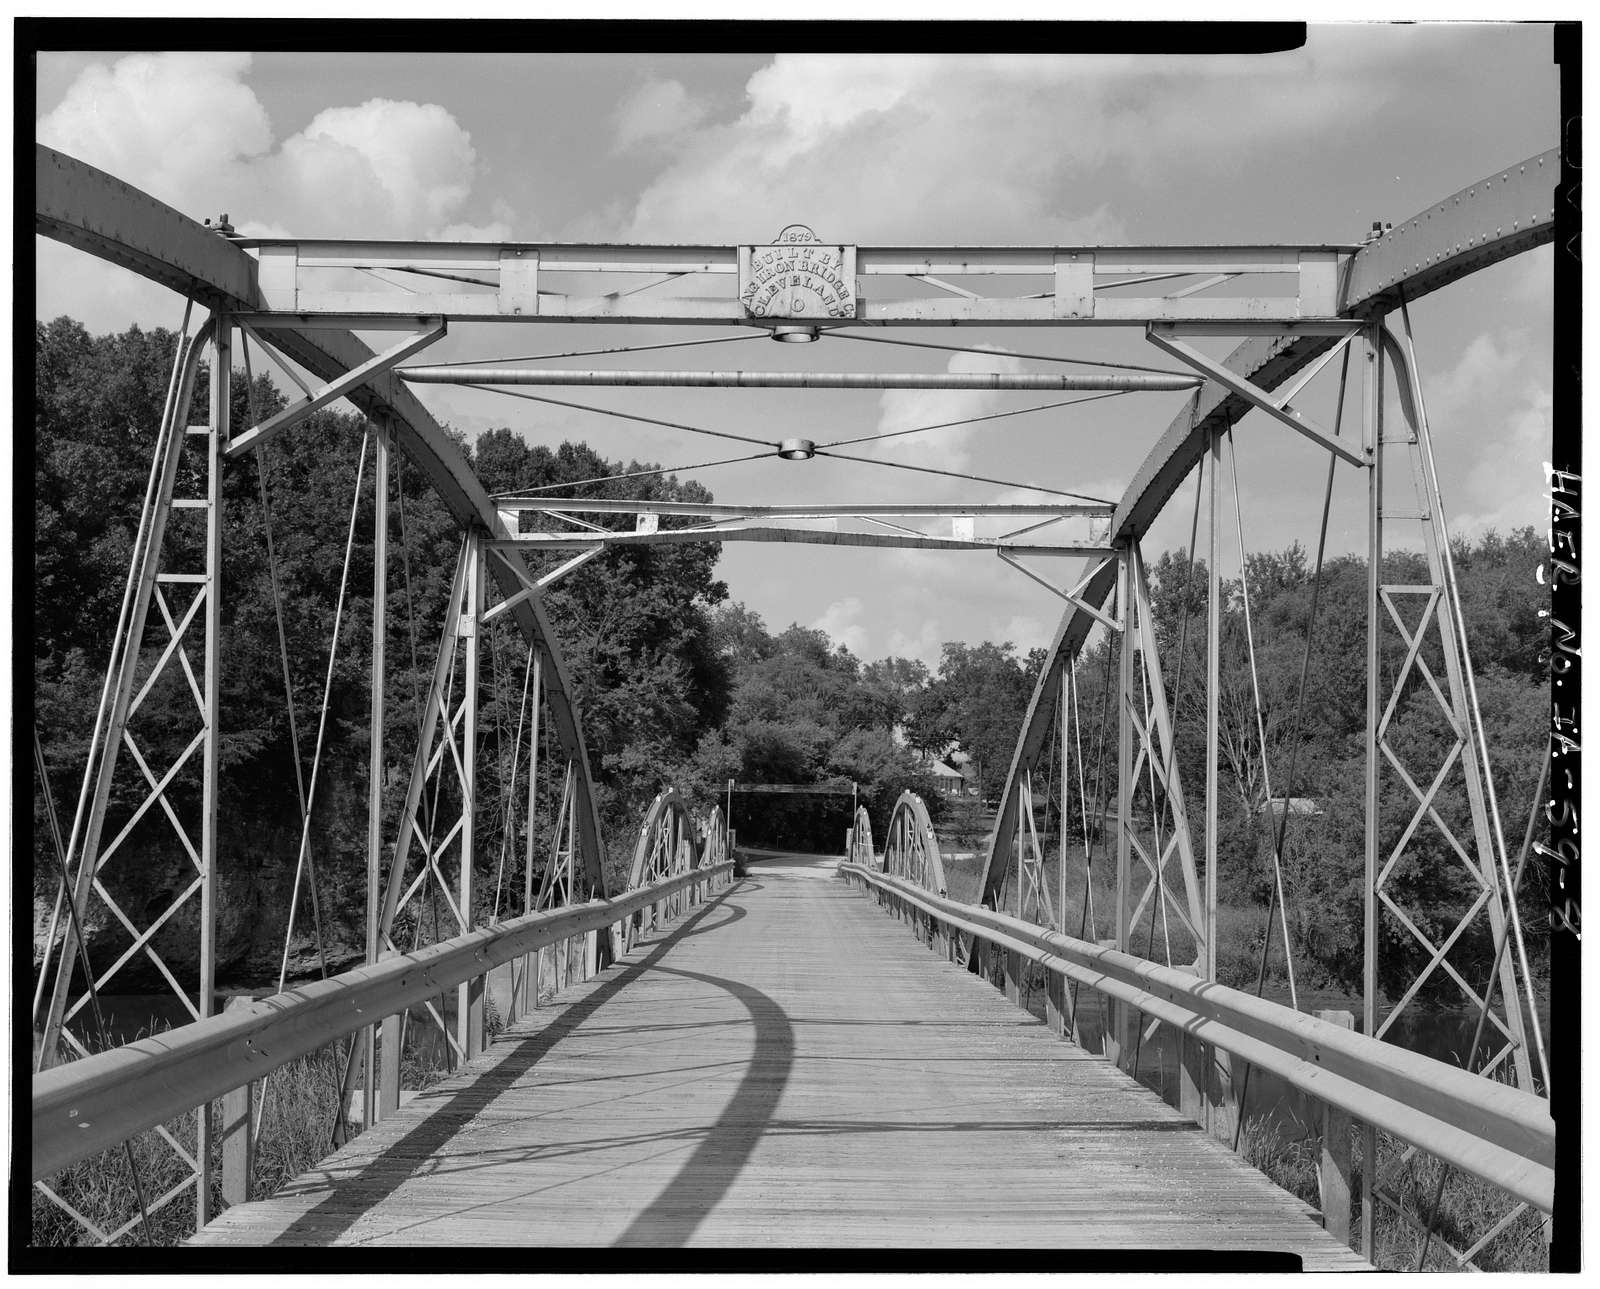 Hale Bridge, Spanning Wapsipinicon River, Oxford Junction, Jones County, IA